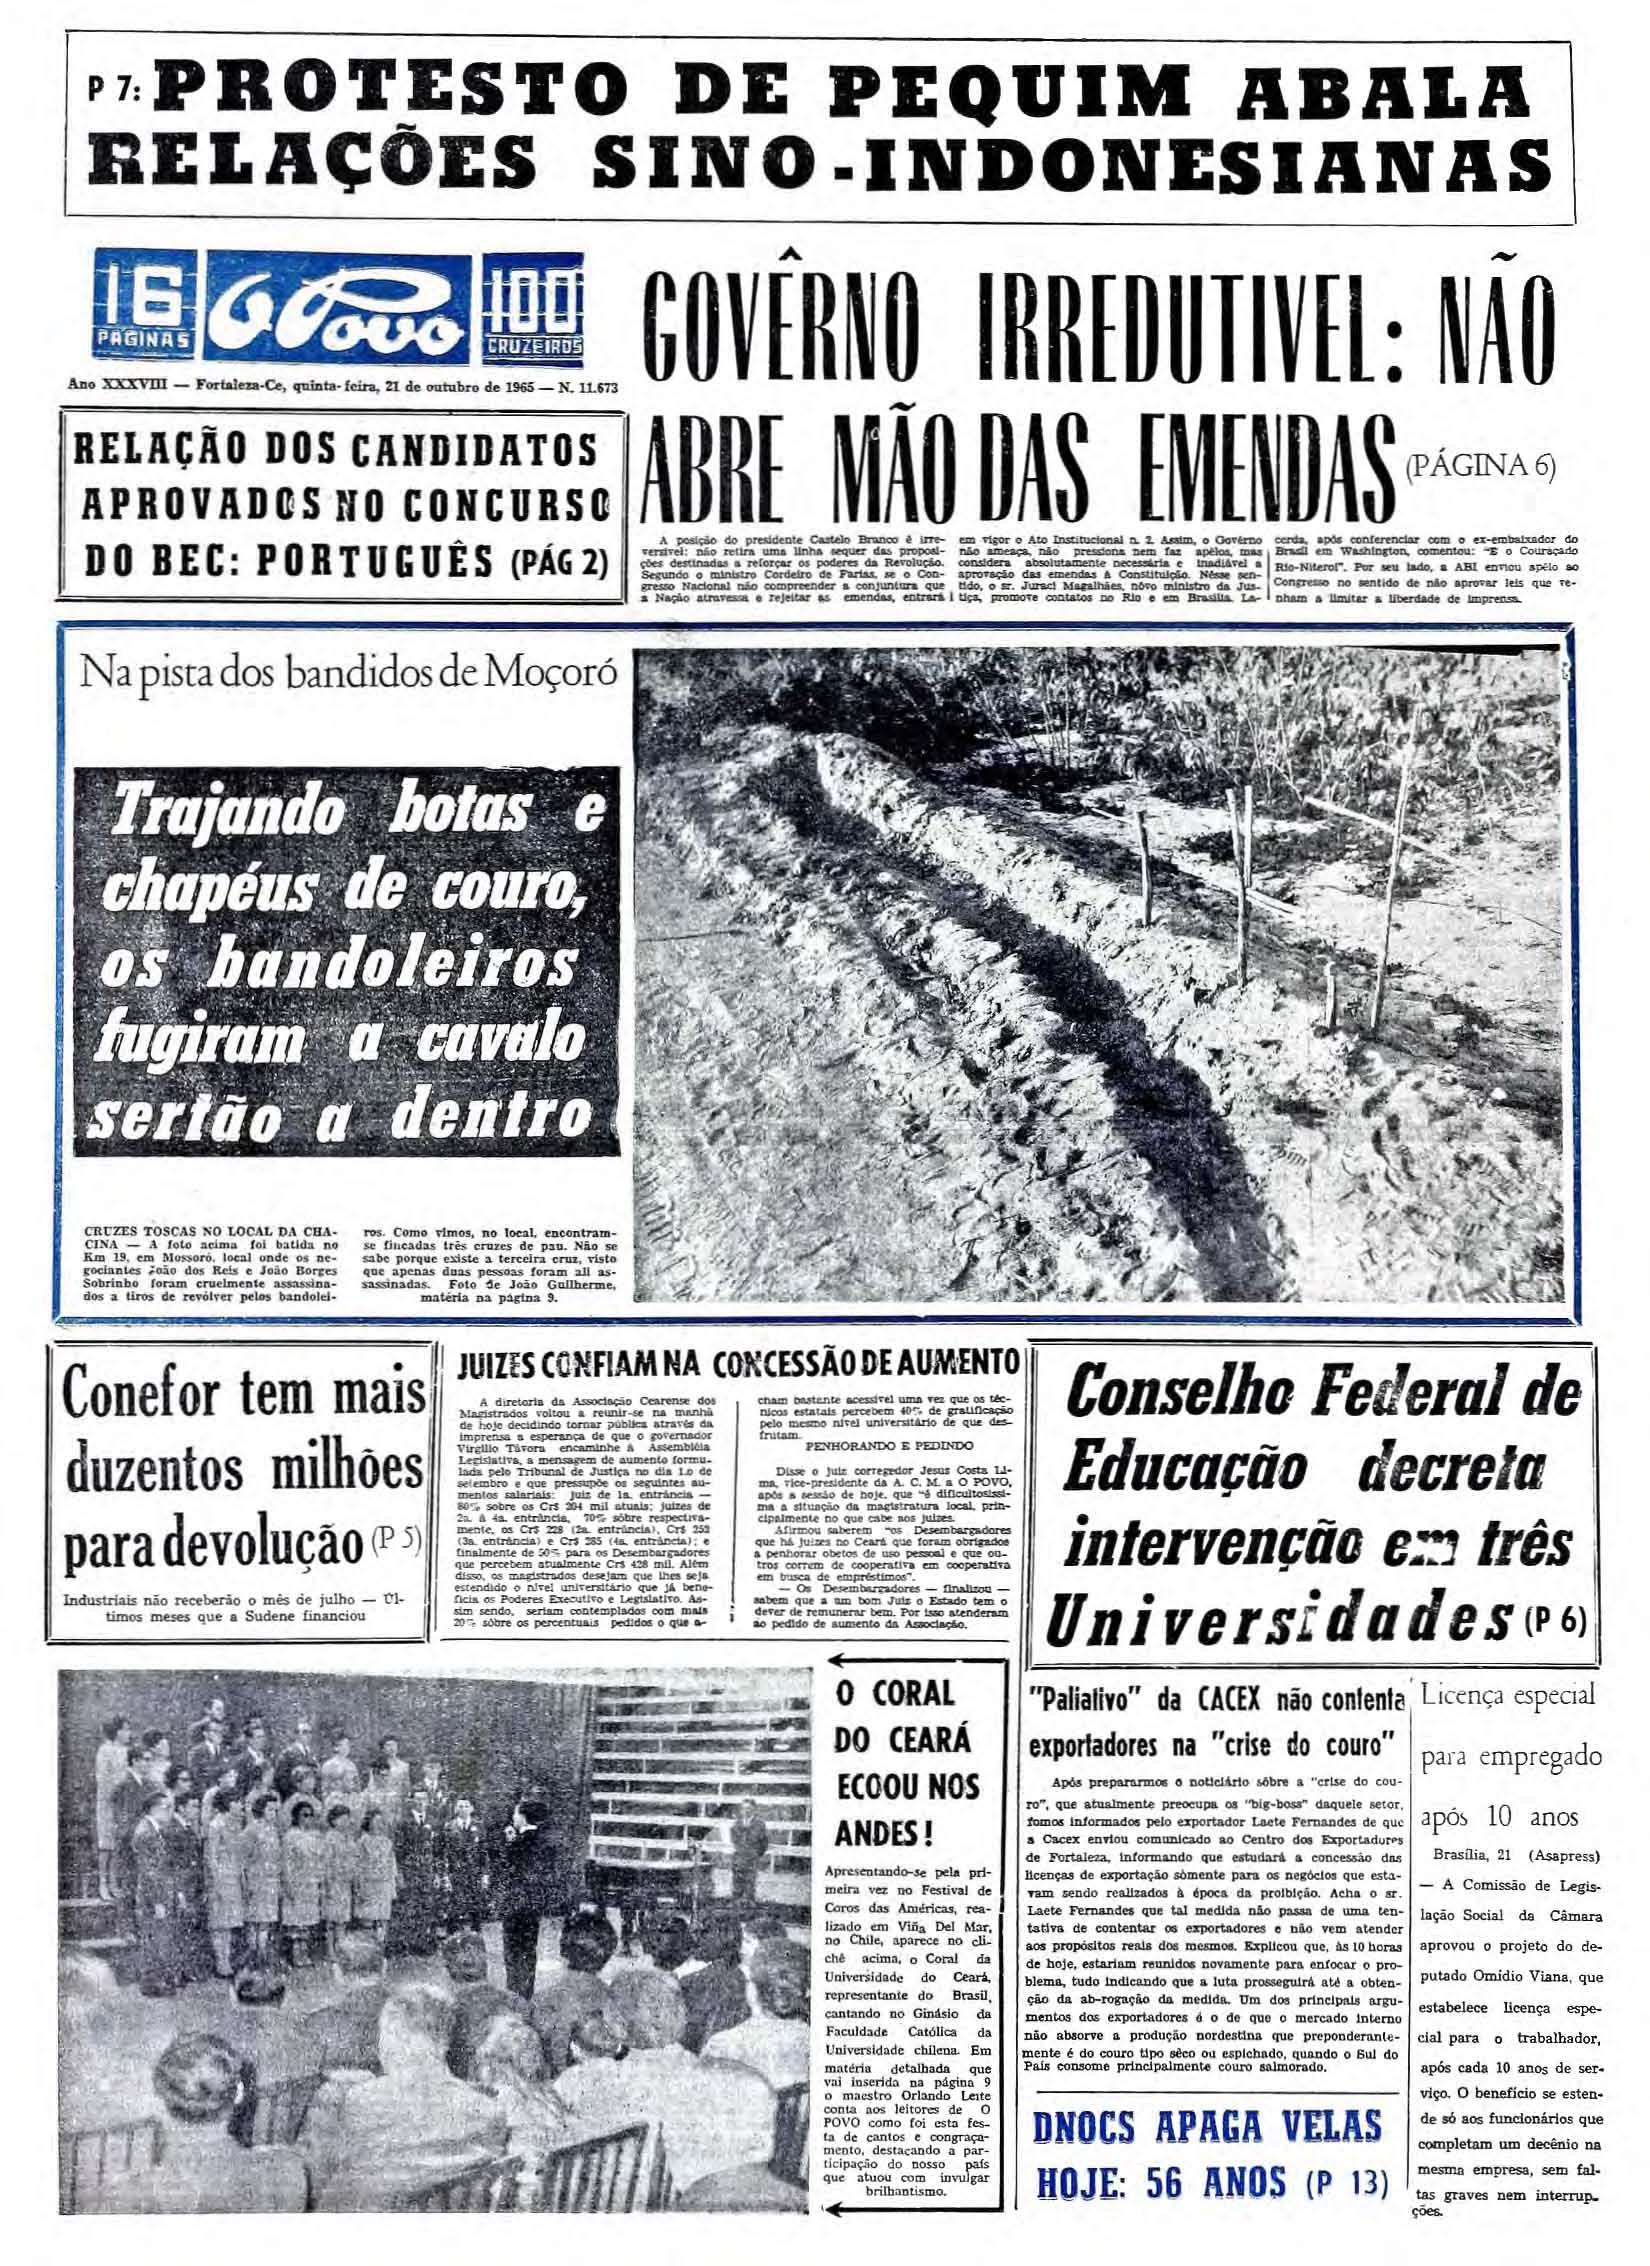 21-10-1965